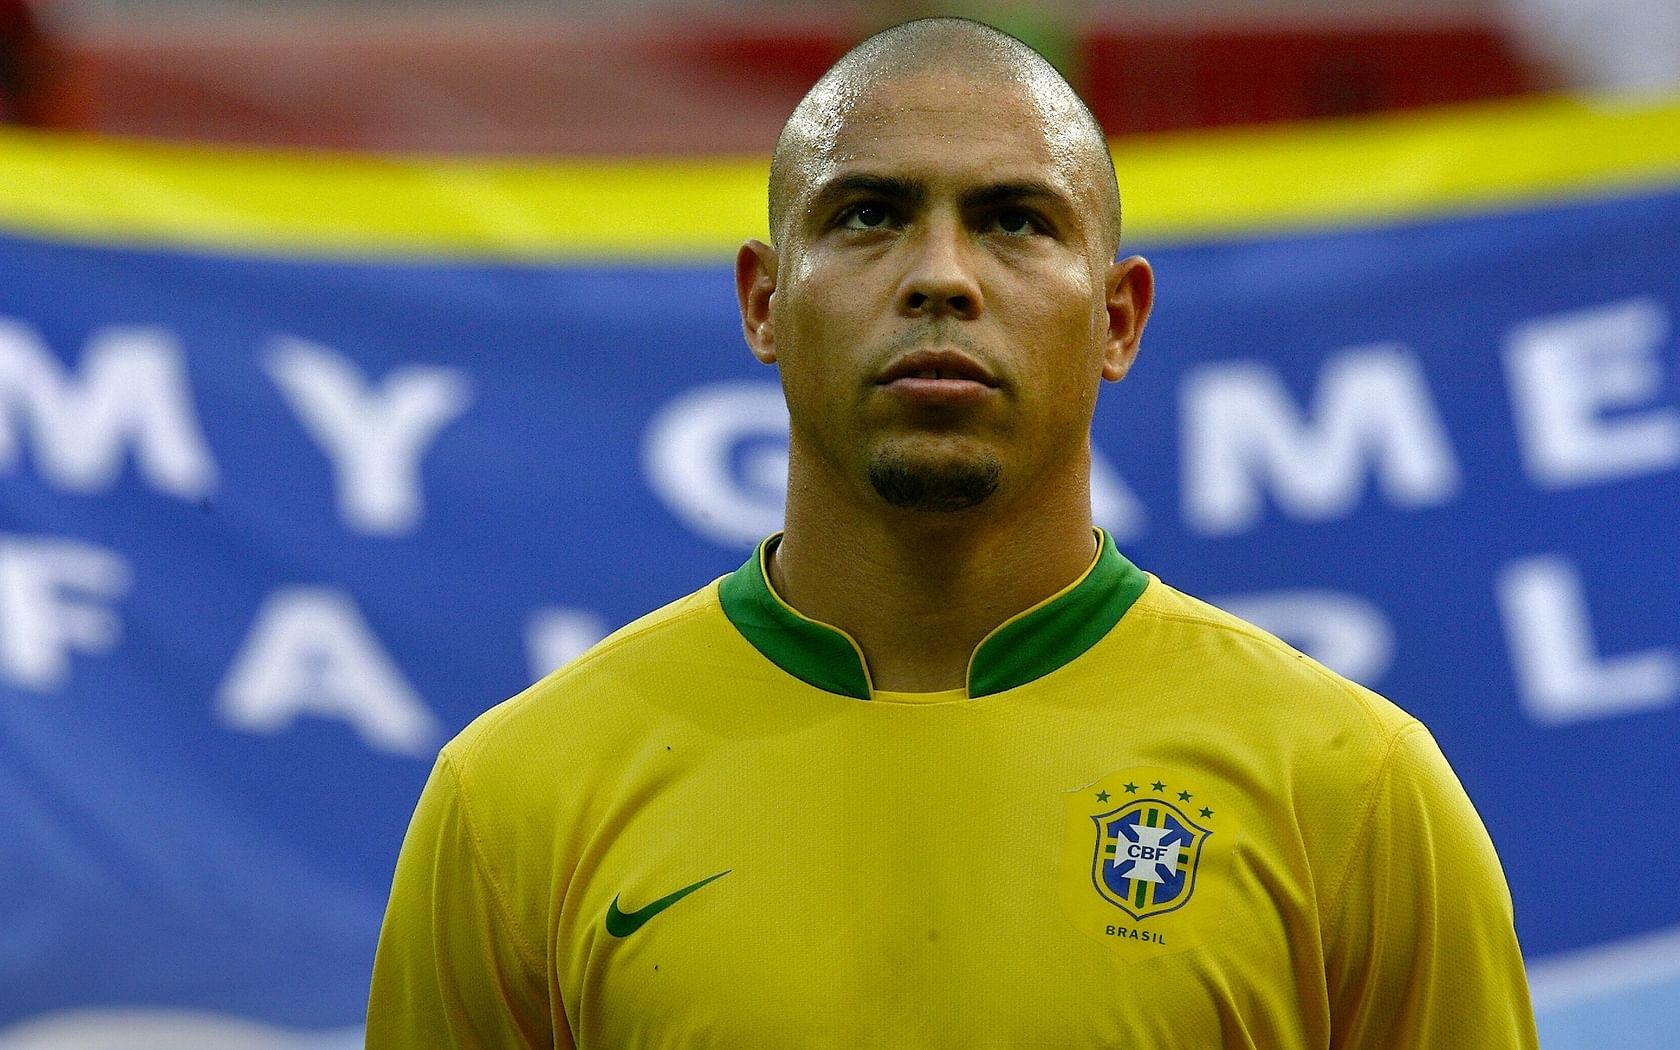 how old is ronaldo brazil